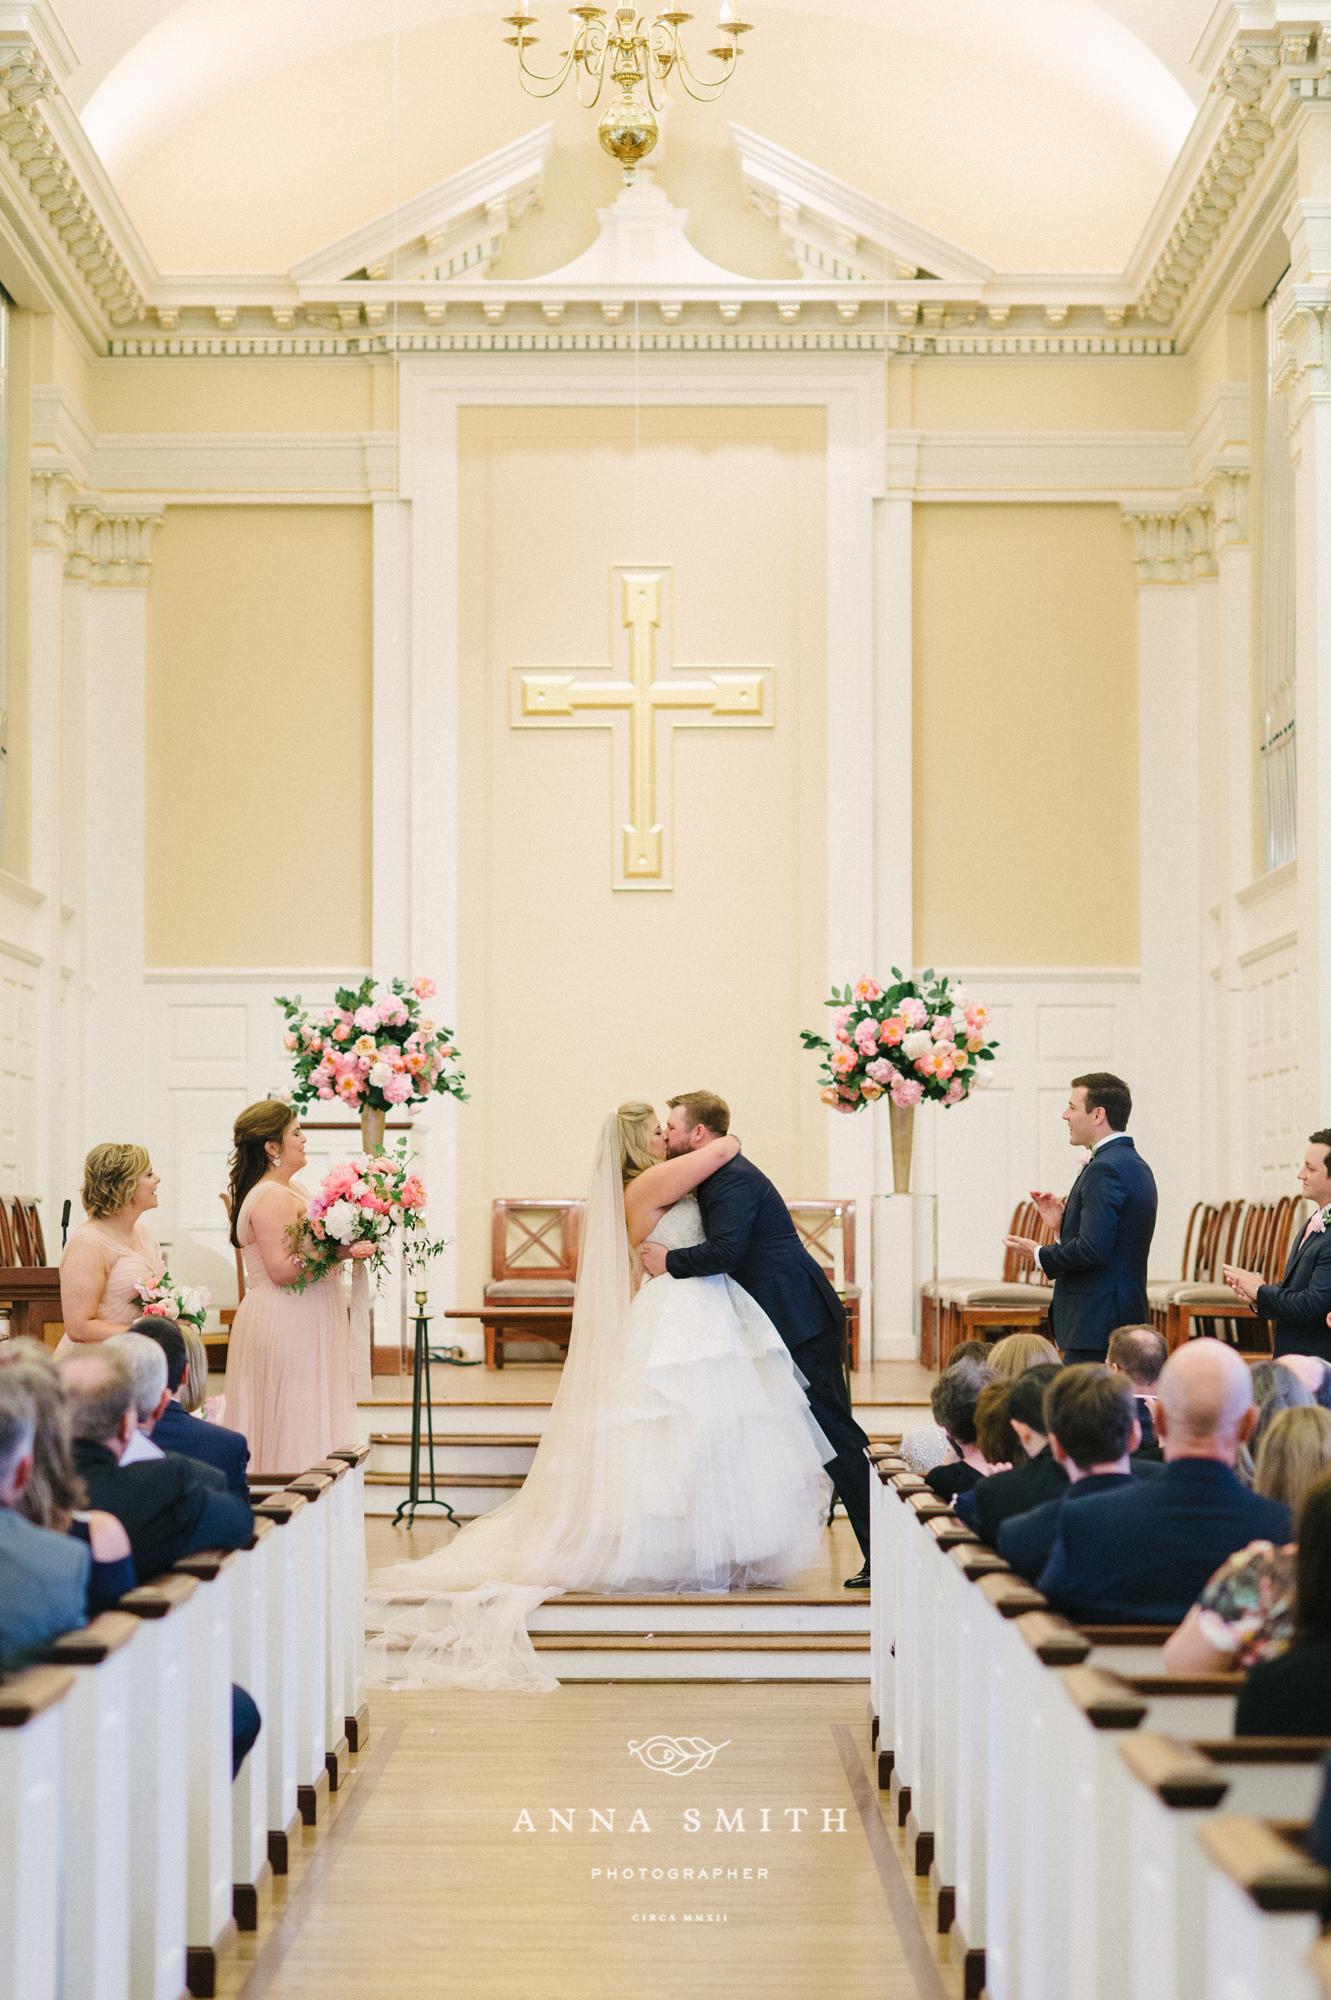 web 17- 4-W-CD-heather brandon wedding perkins adolphus-707.jpg